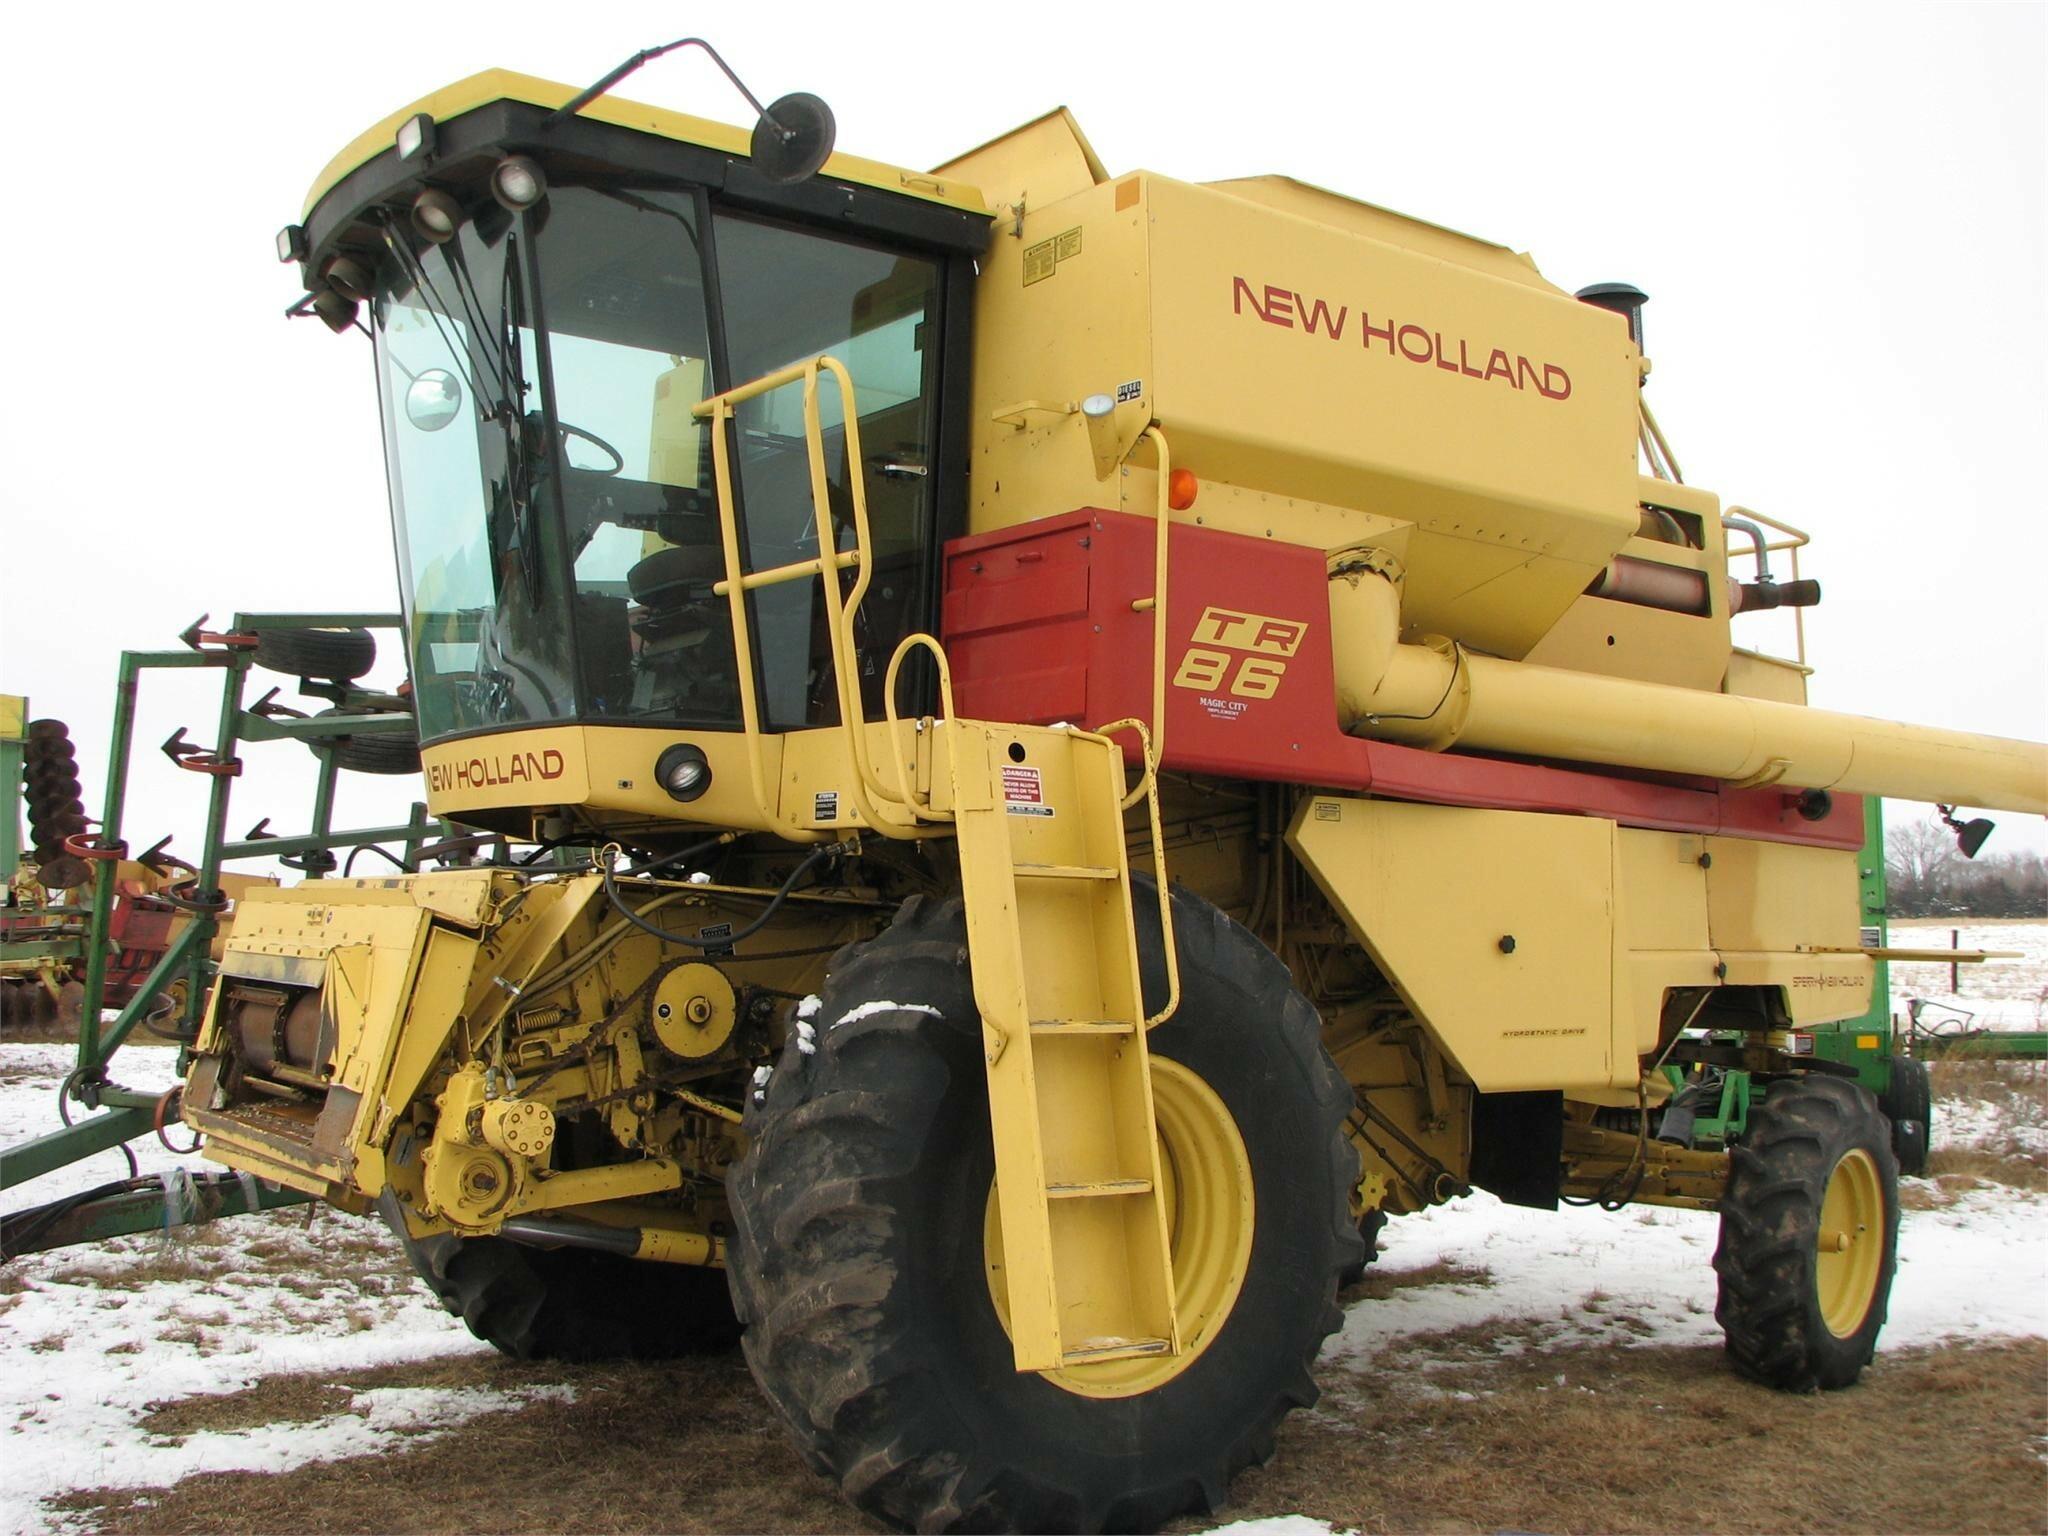 1986 New Holland TR86 Combine